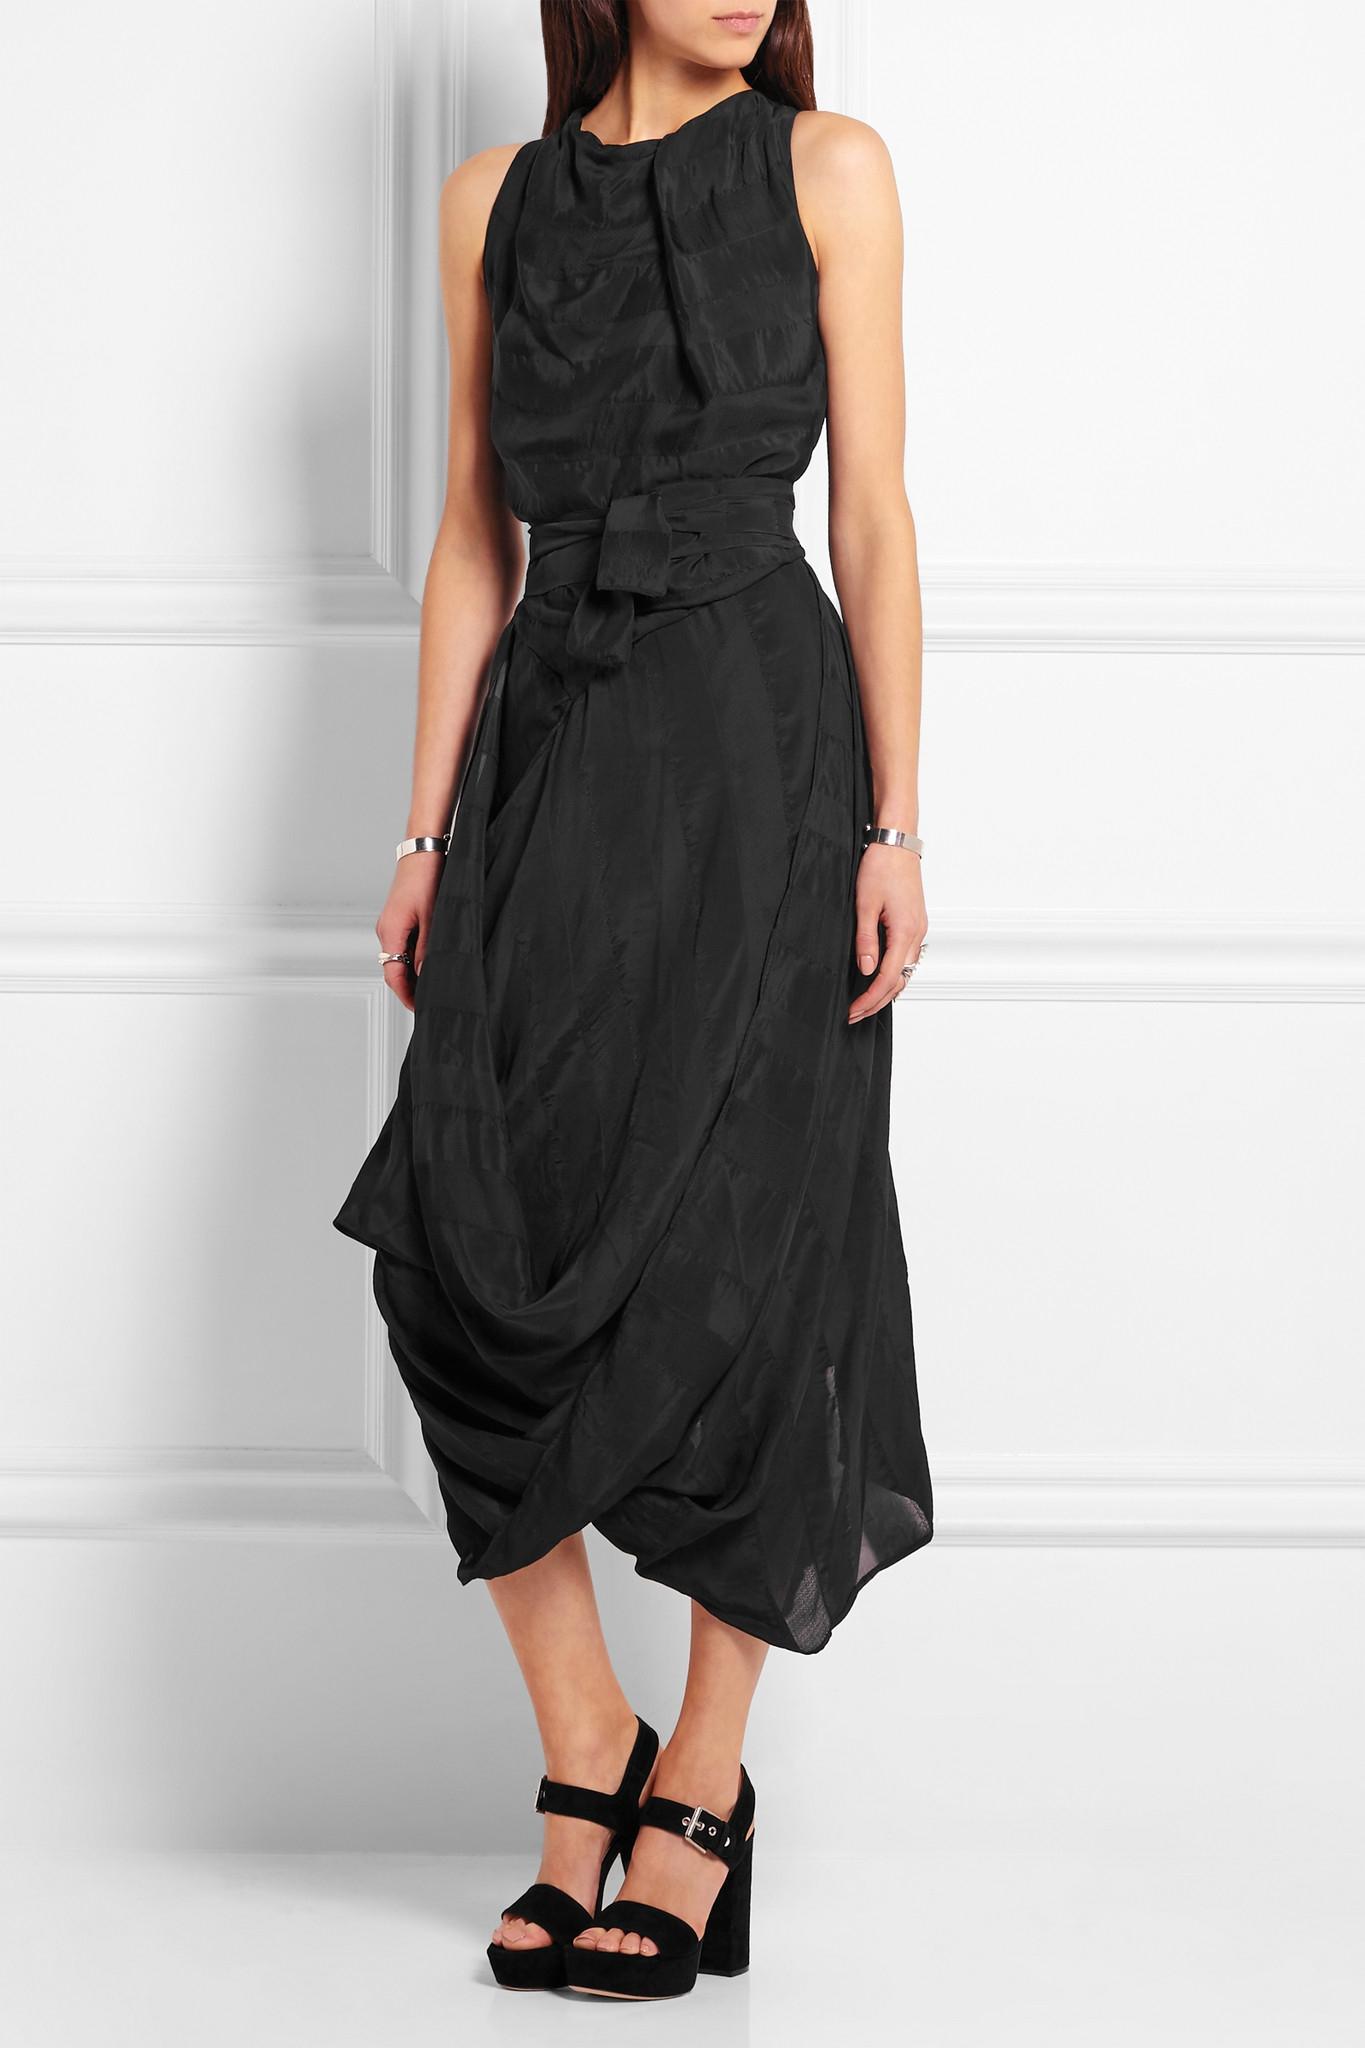 e7b9047870d Vivienne Westwood Anglomania Eight Asymmetric Striped Taffeta Dress ...